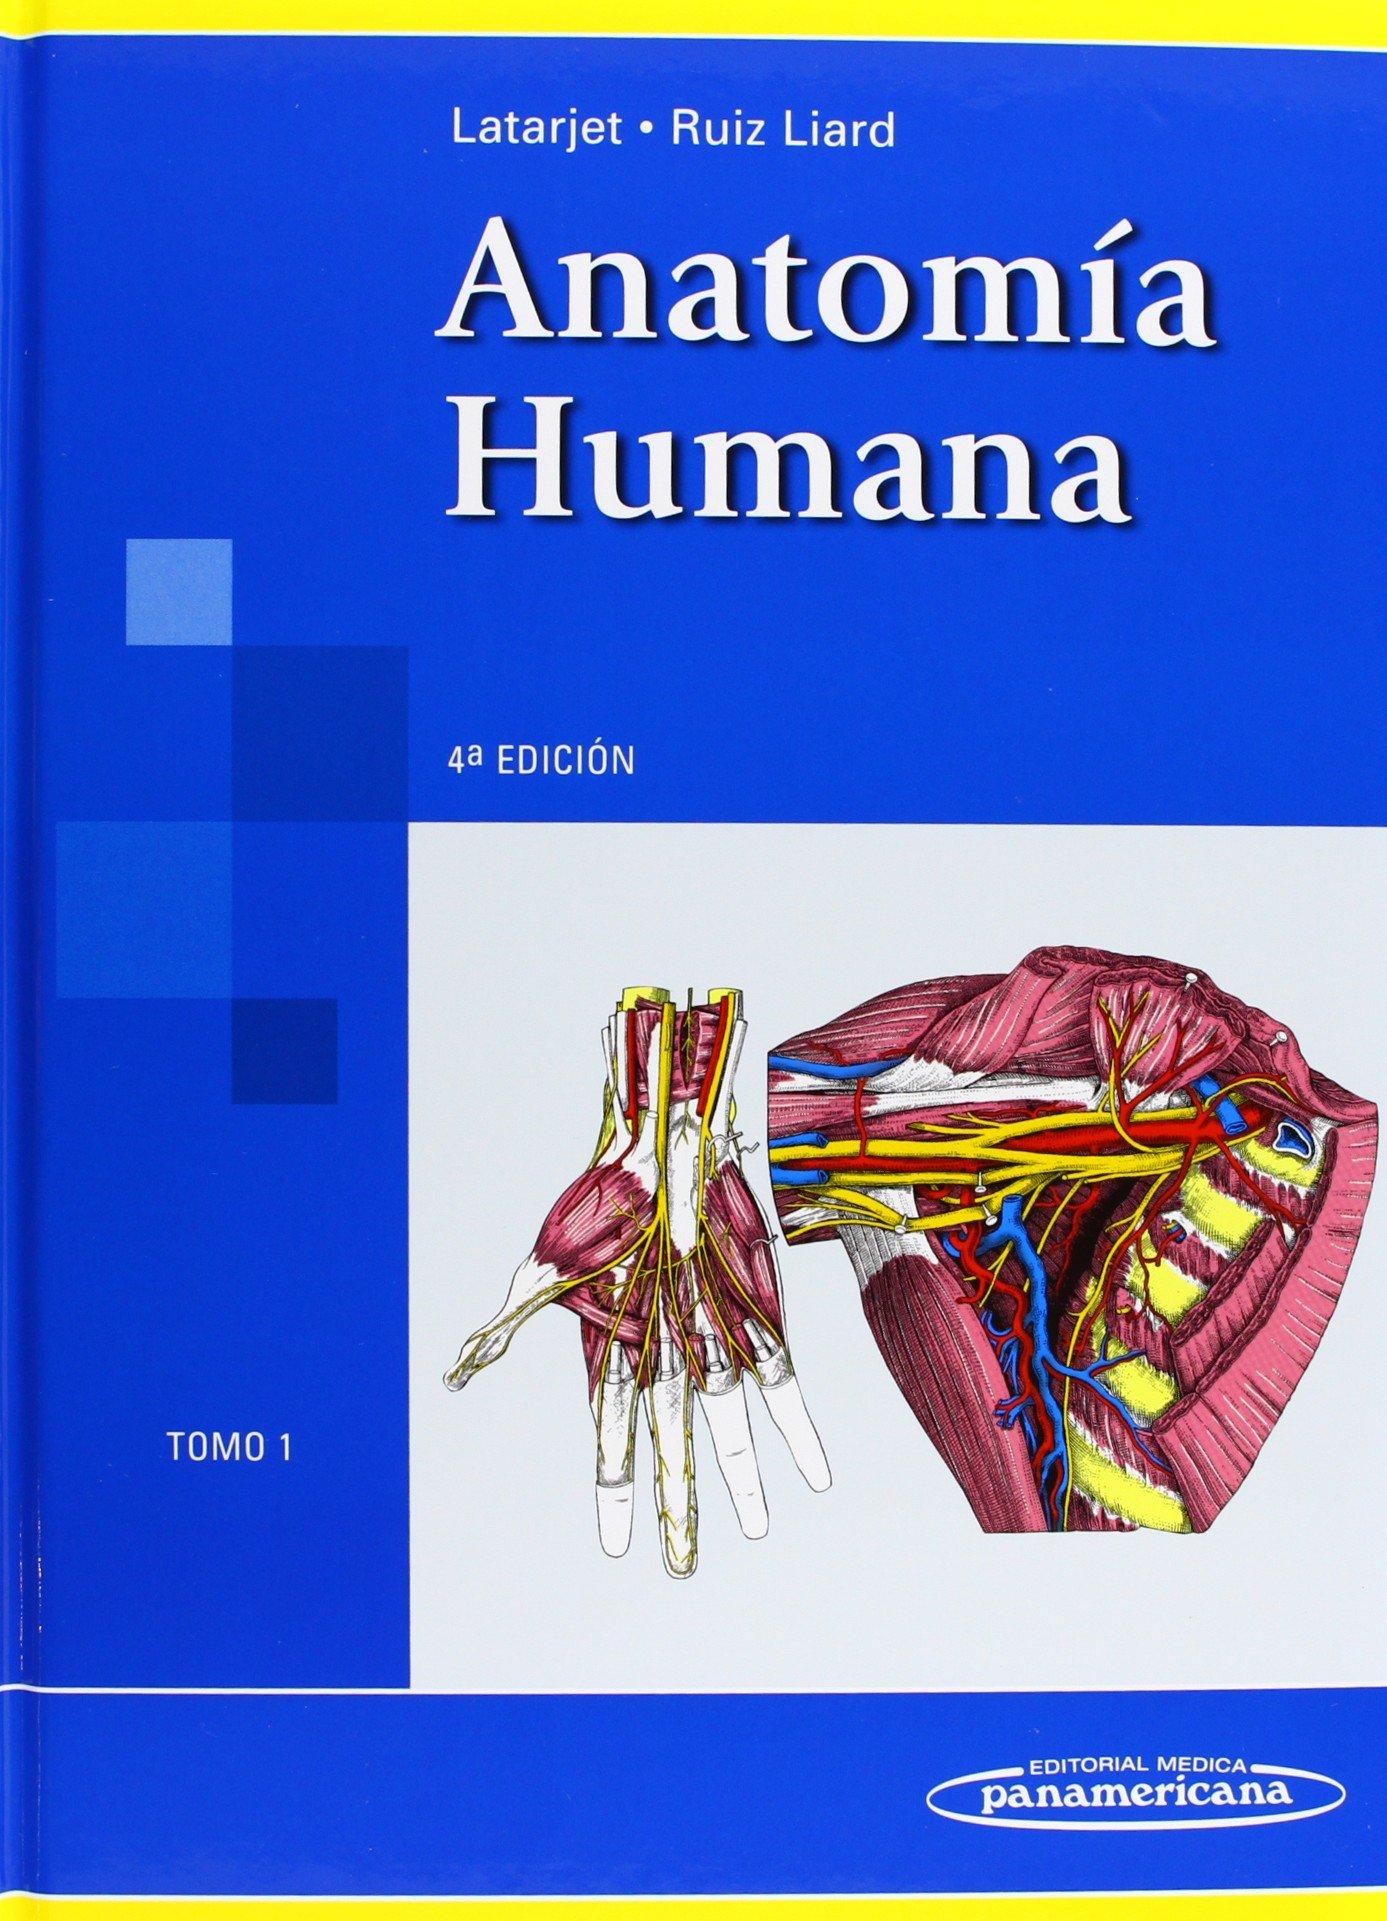 Anatomía humana: 1: Michel Latarjet, Alfredo Ruiz Liard: Amazon.com ...